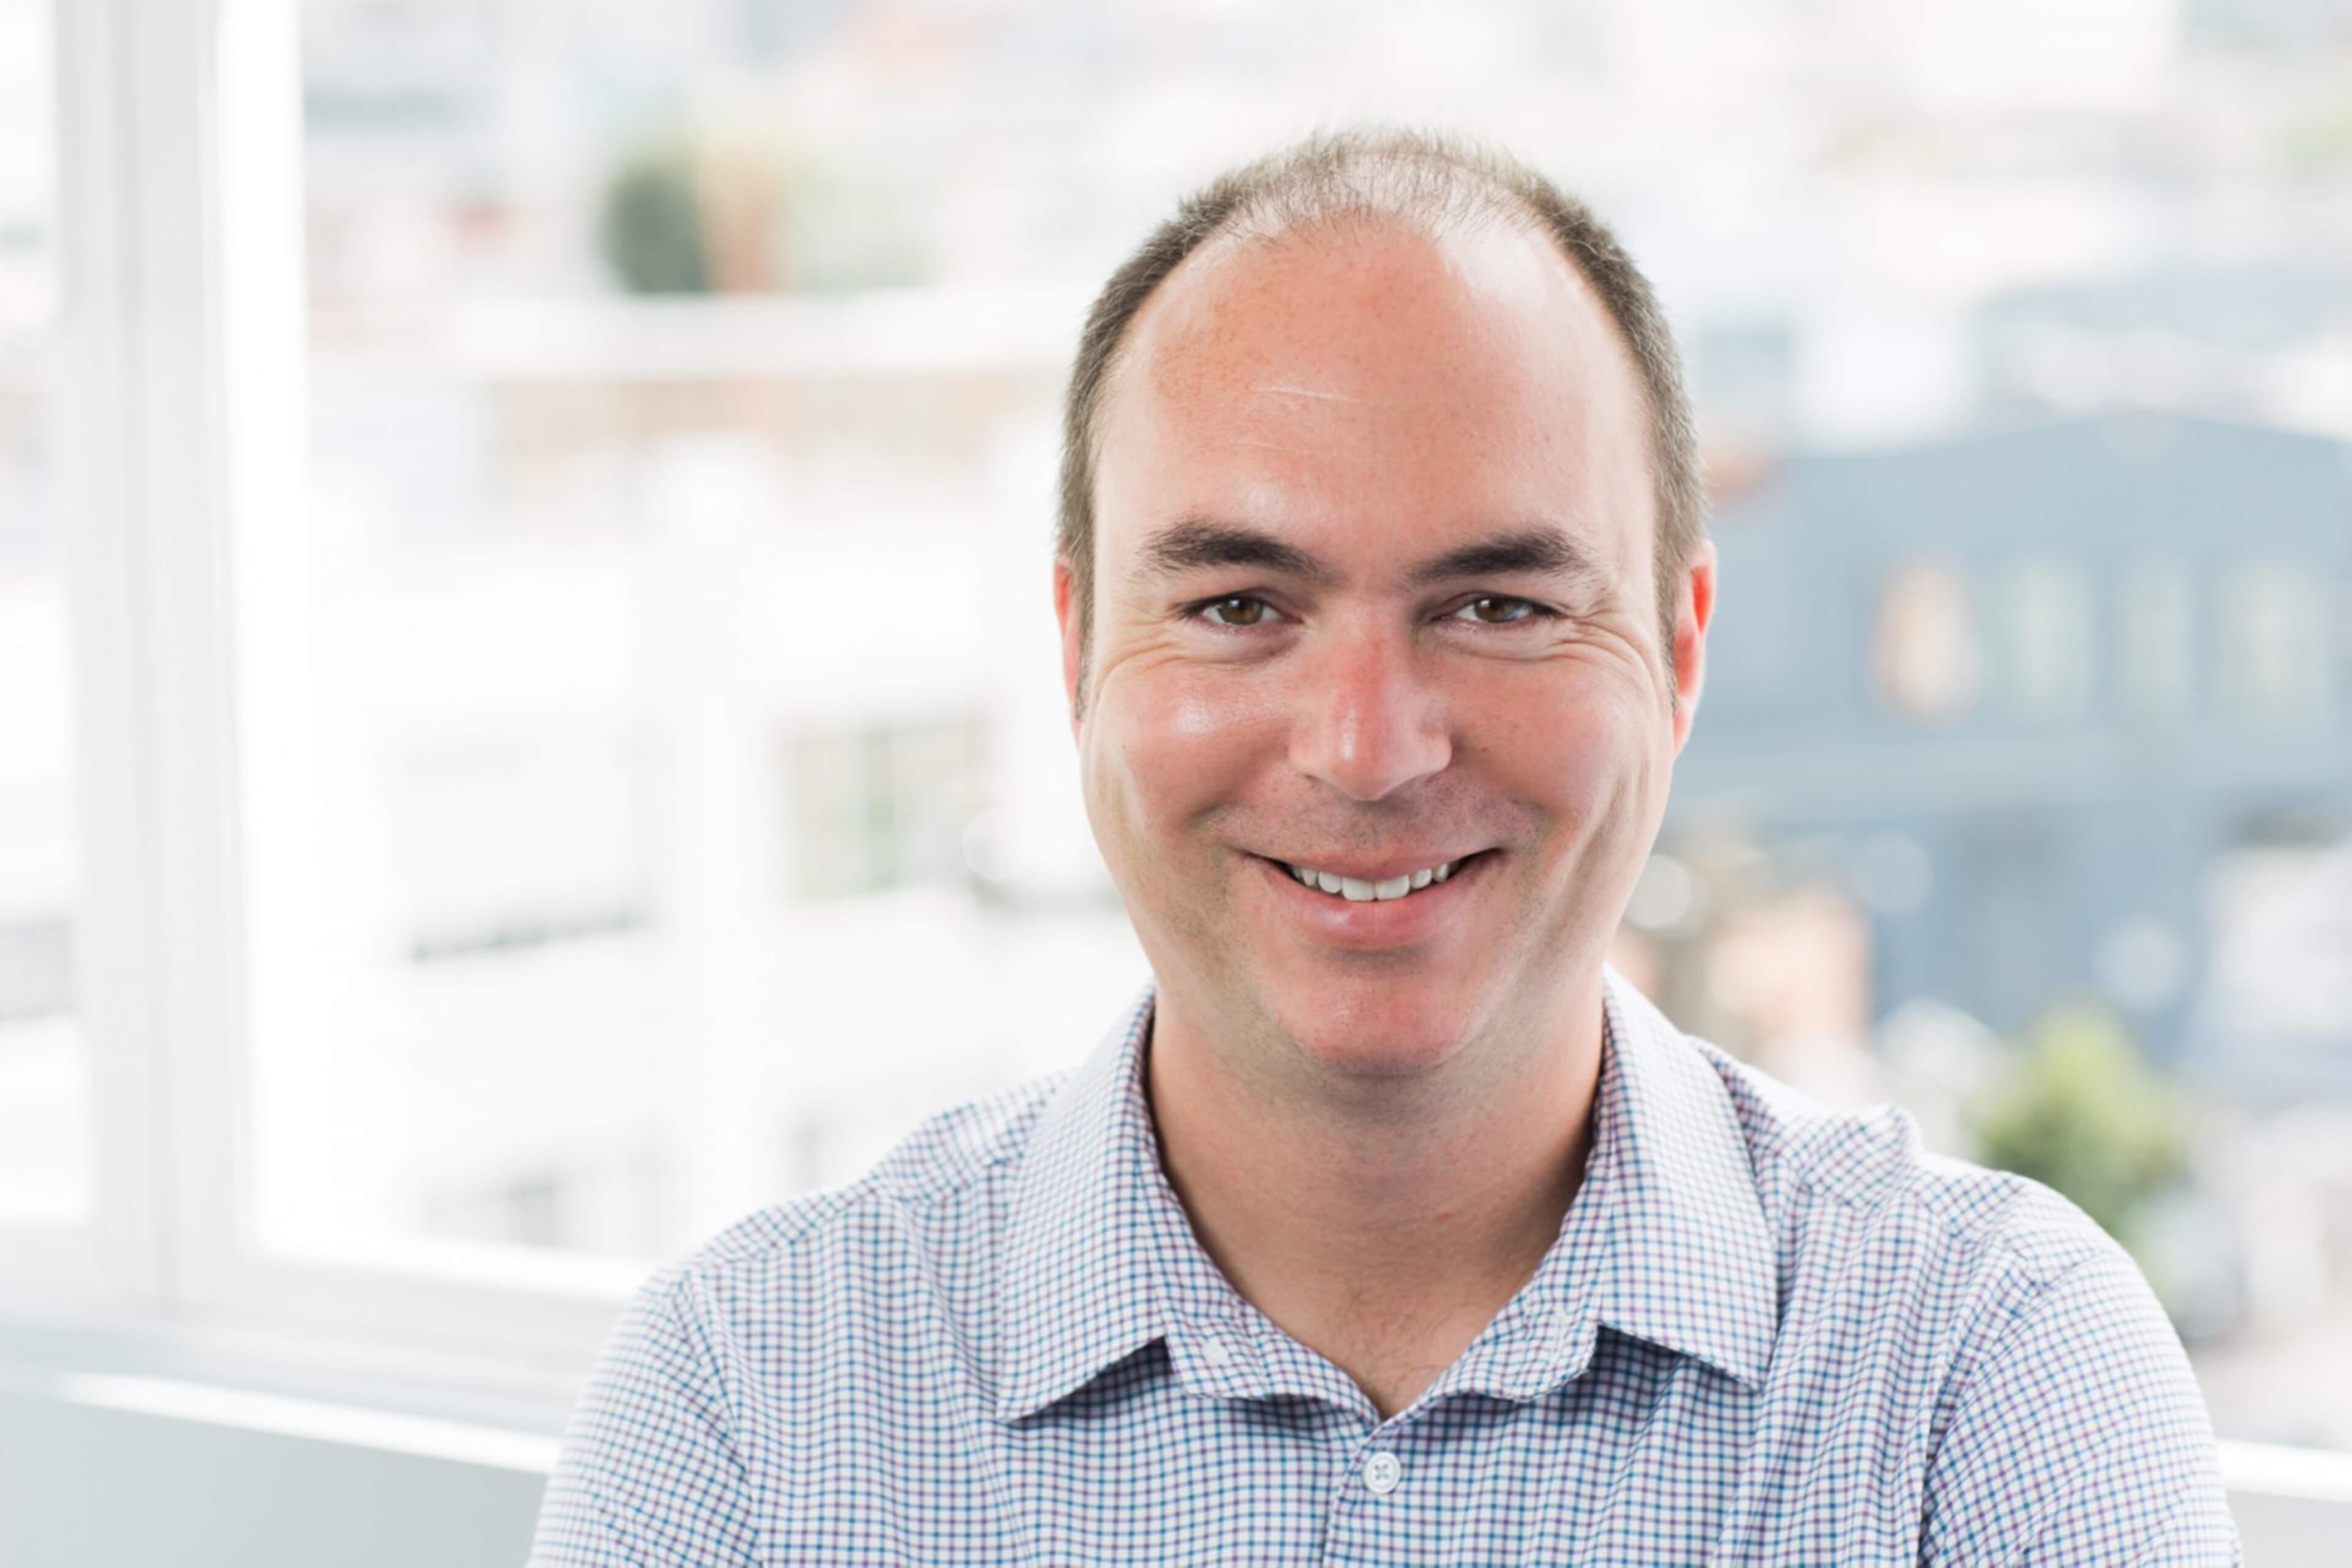 Stephane Kasriel, CEO of Upwork